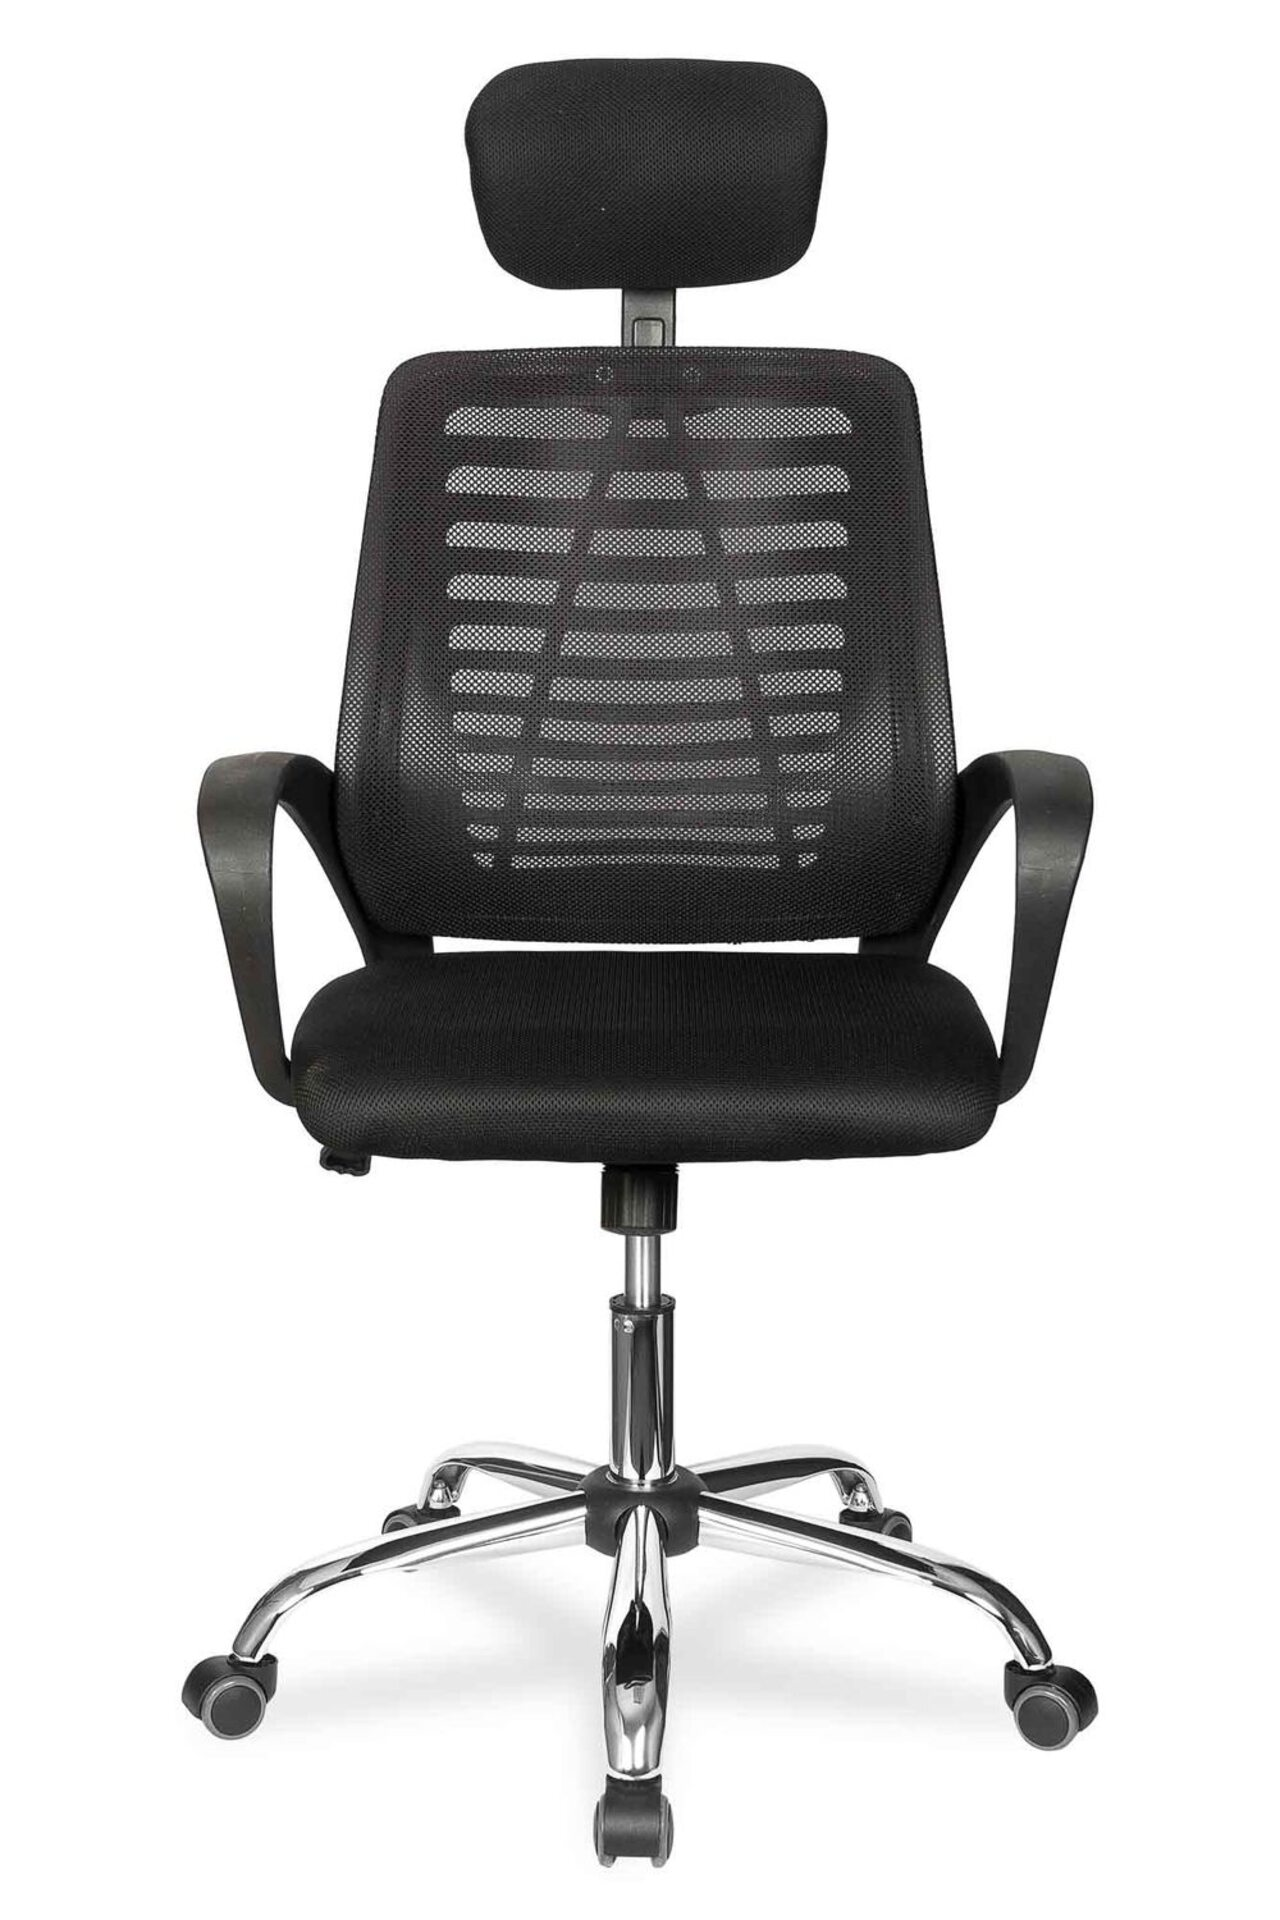 Кресло руководителя College CLG-422 MXH-A - фото 3